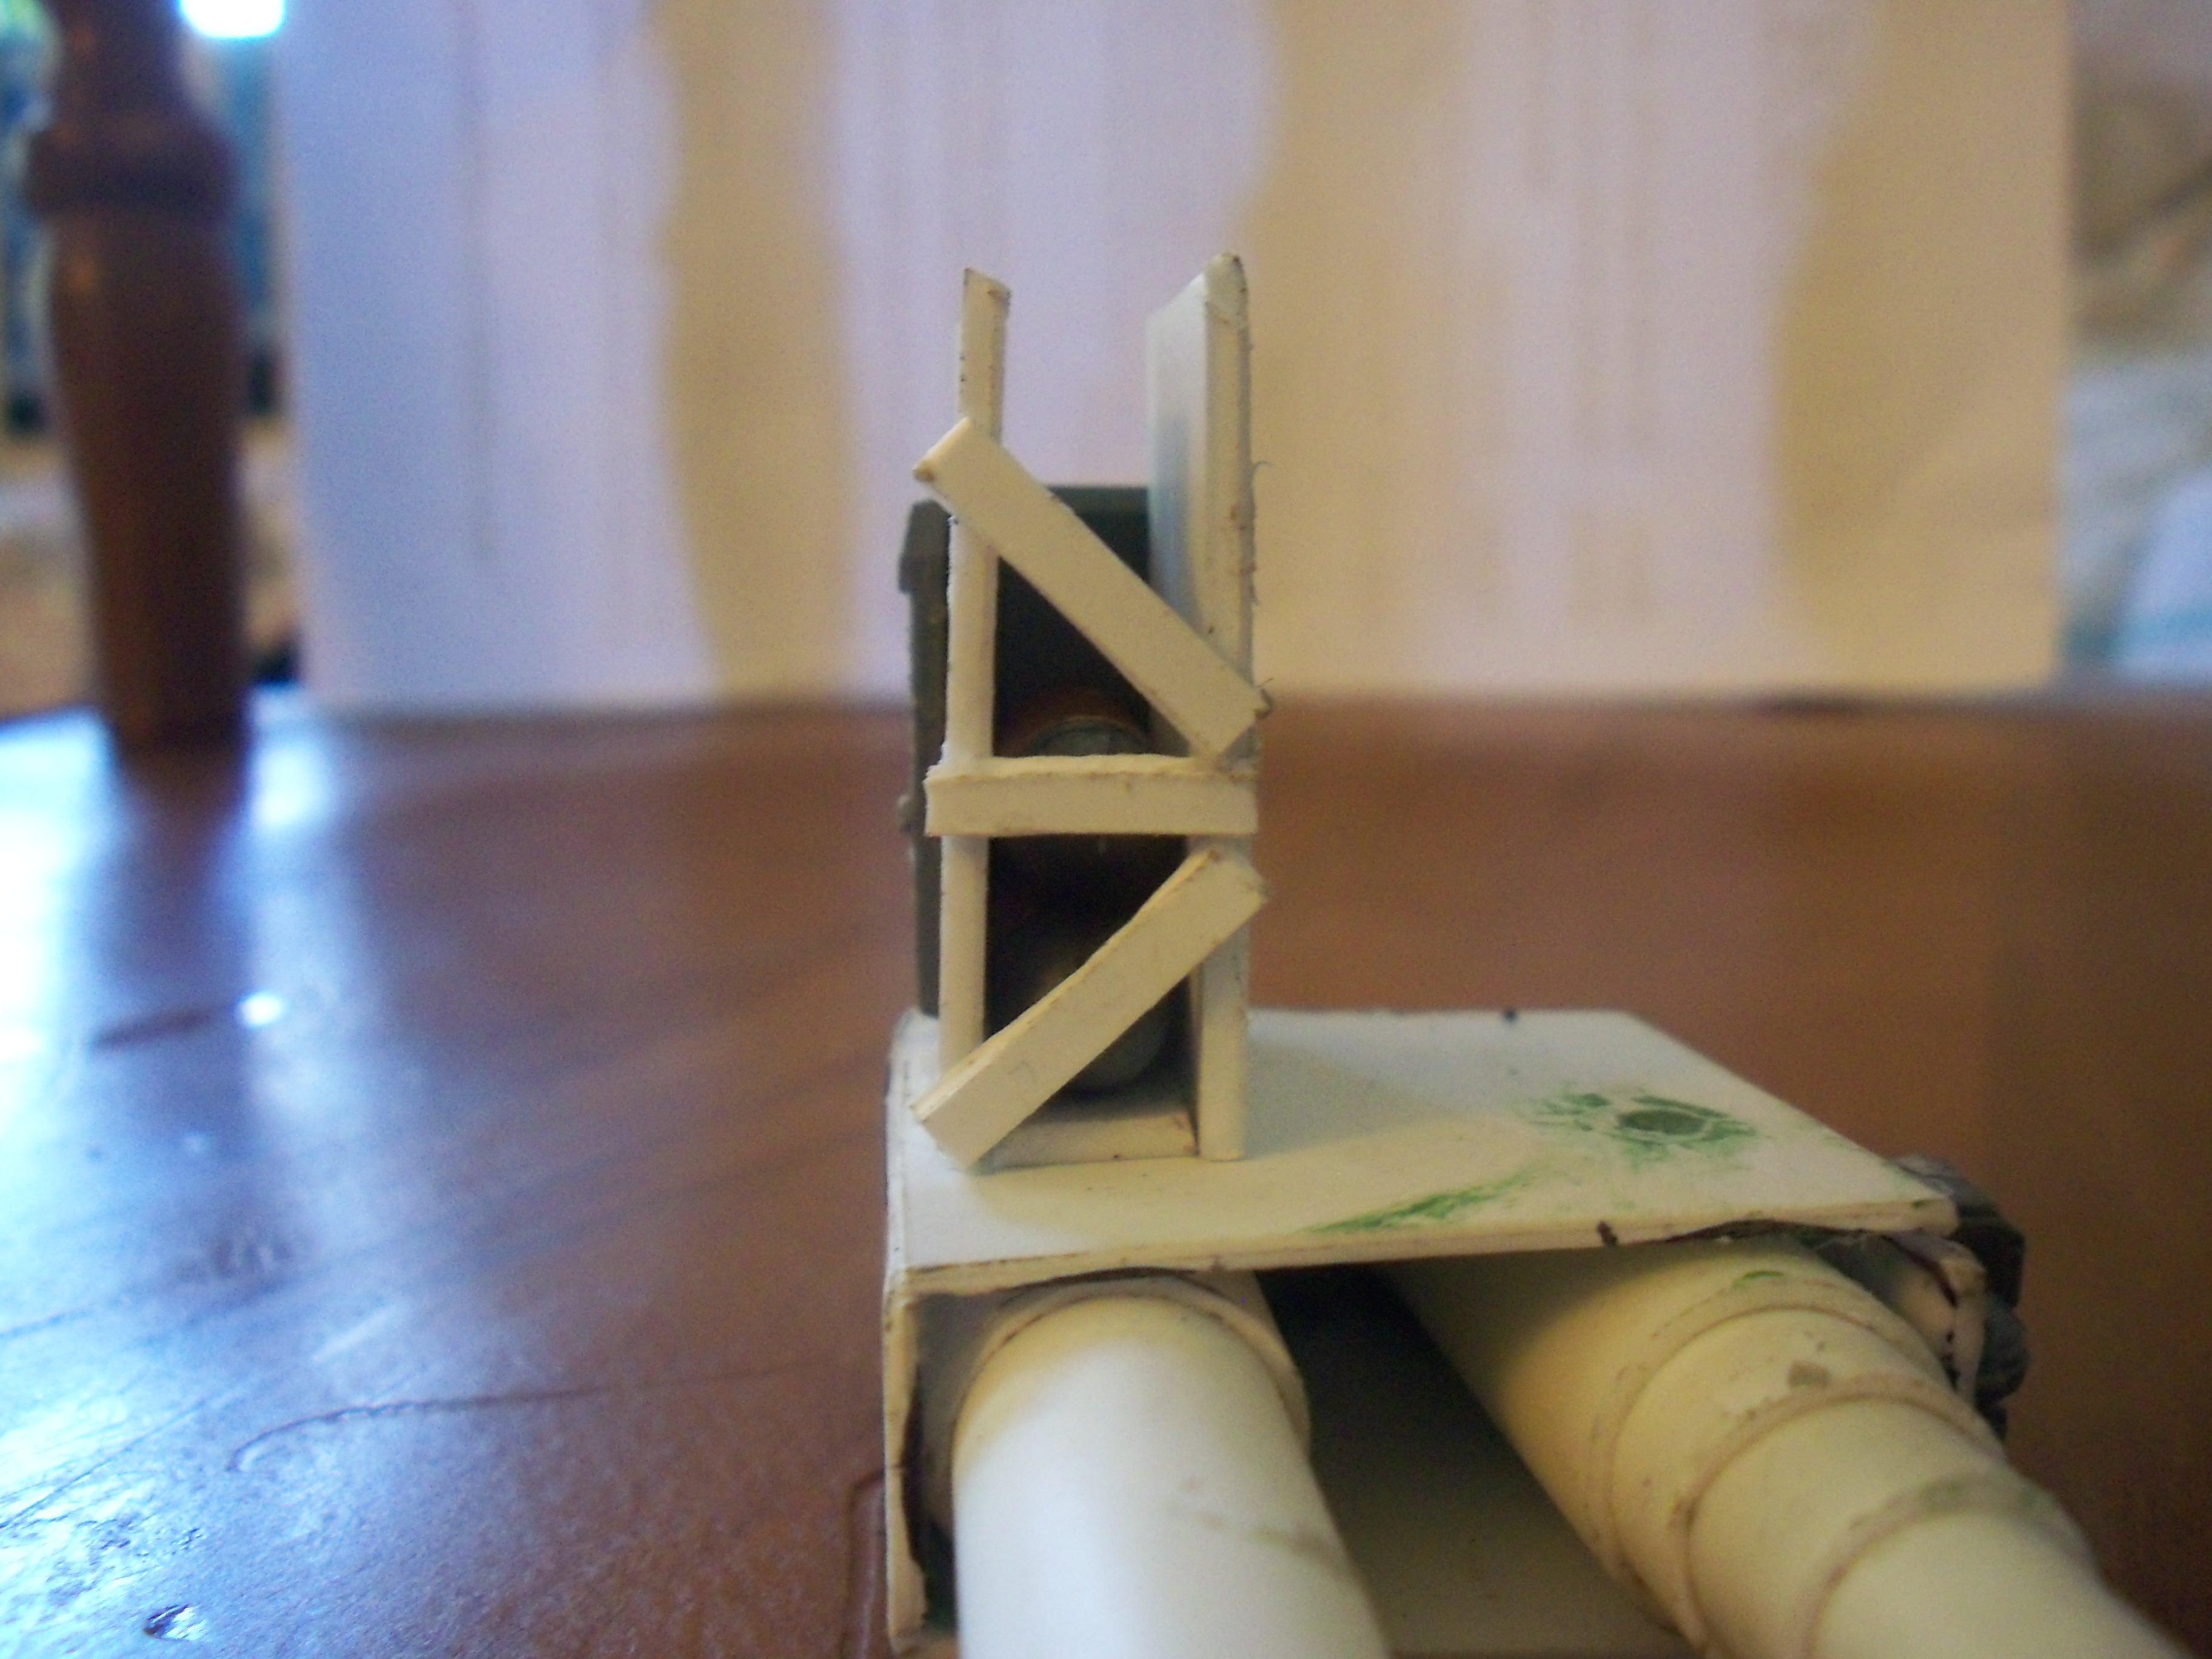 Ammo Hopper, Conversion, Orks, Plasticard, Turret